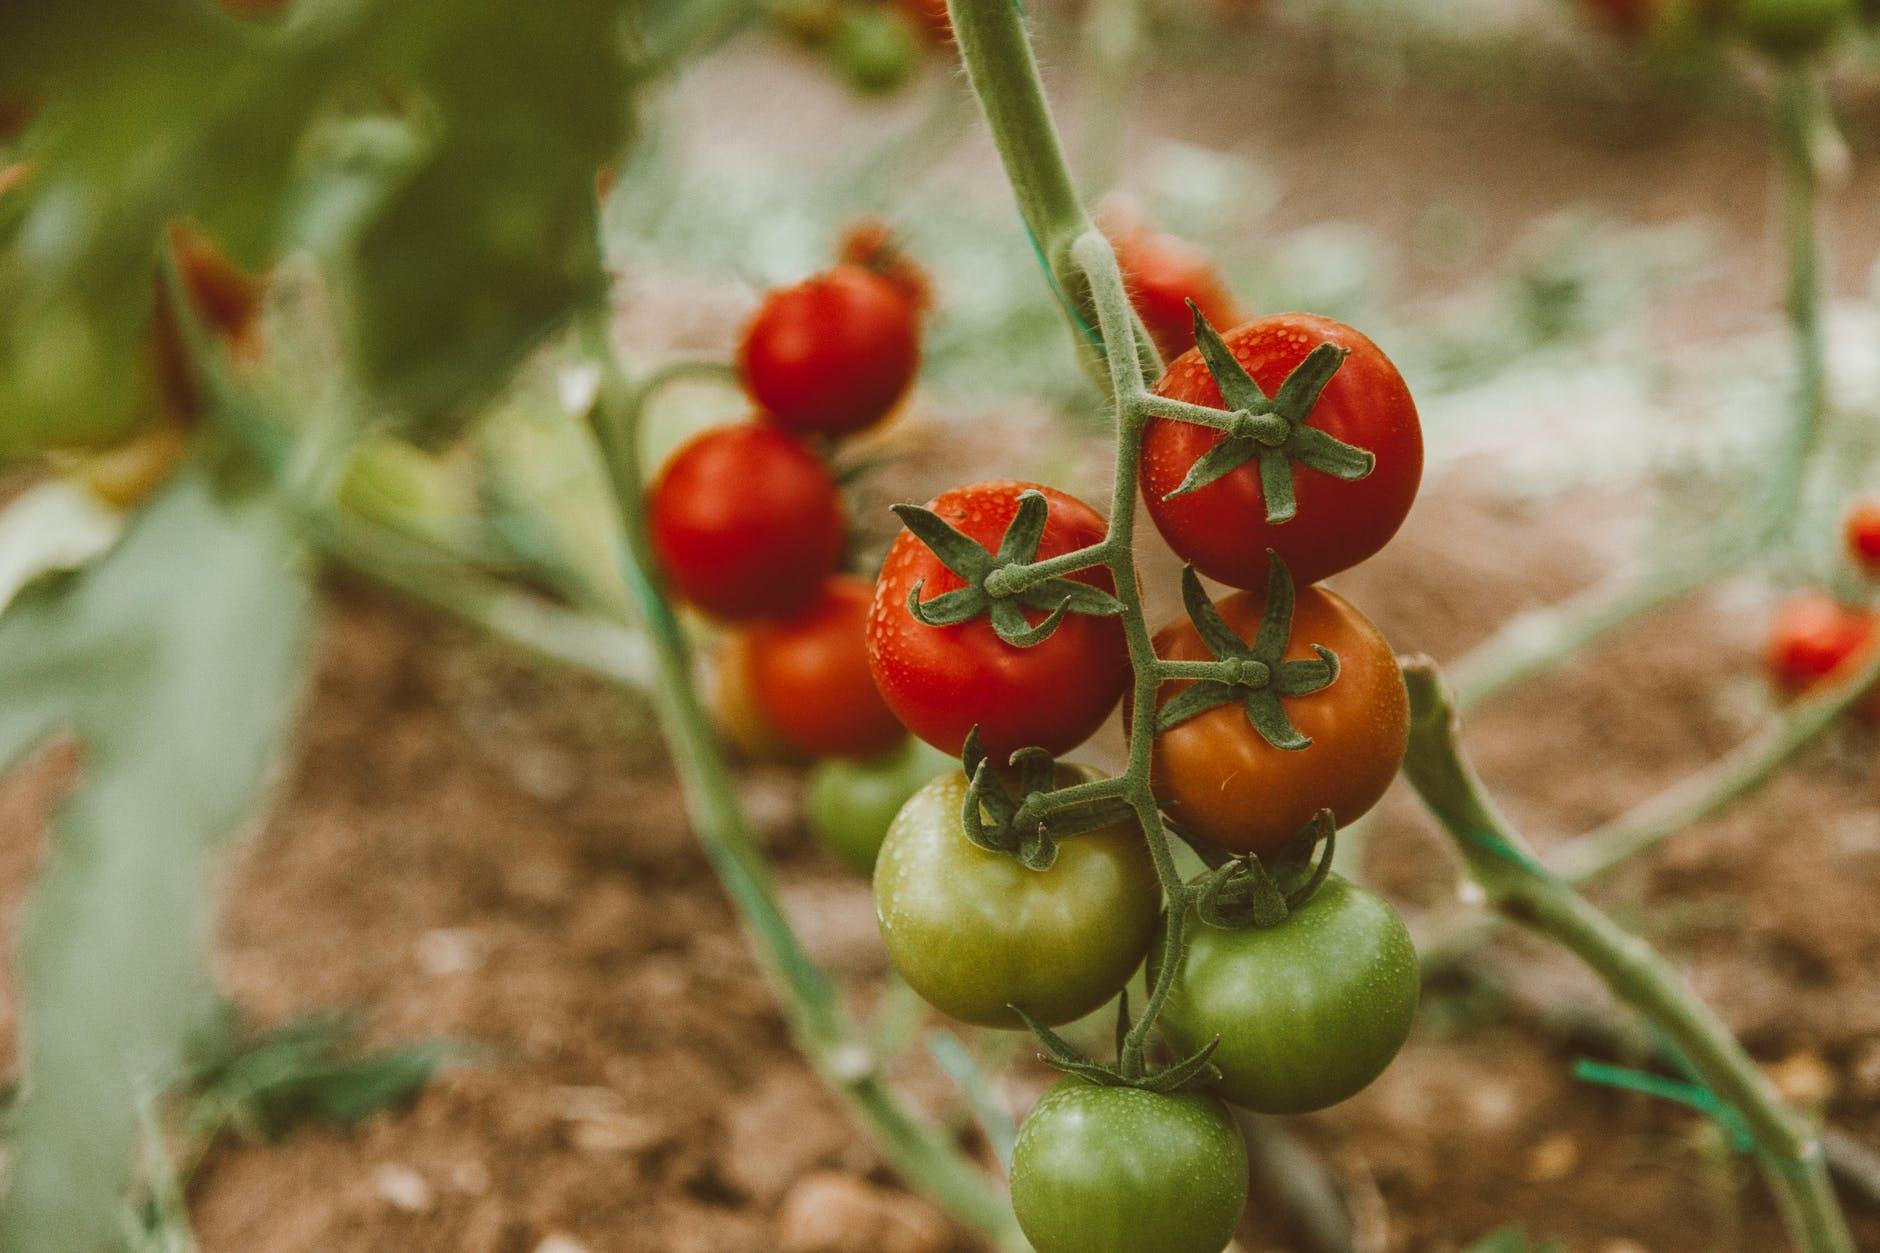 Prune tomato plants-how to prune tomato plants 2021